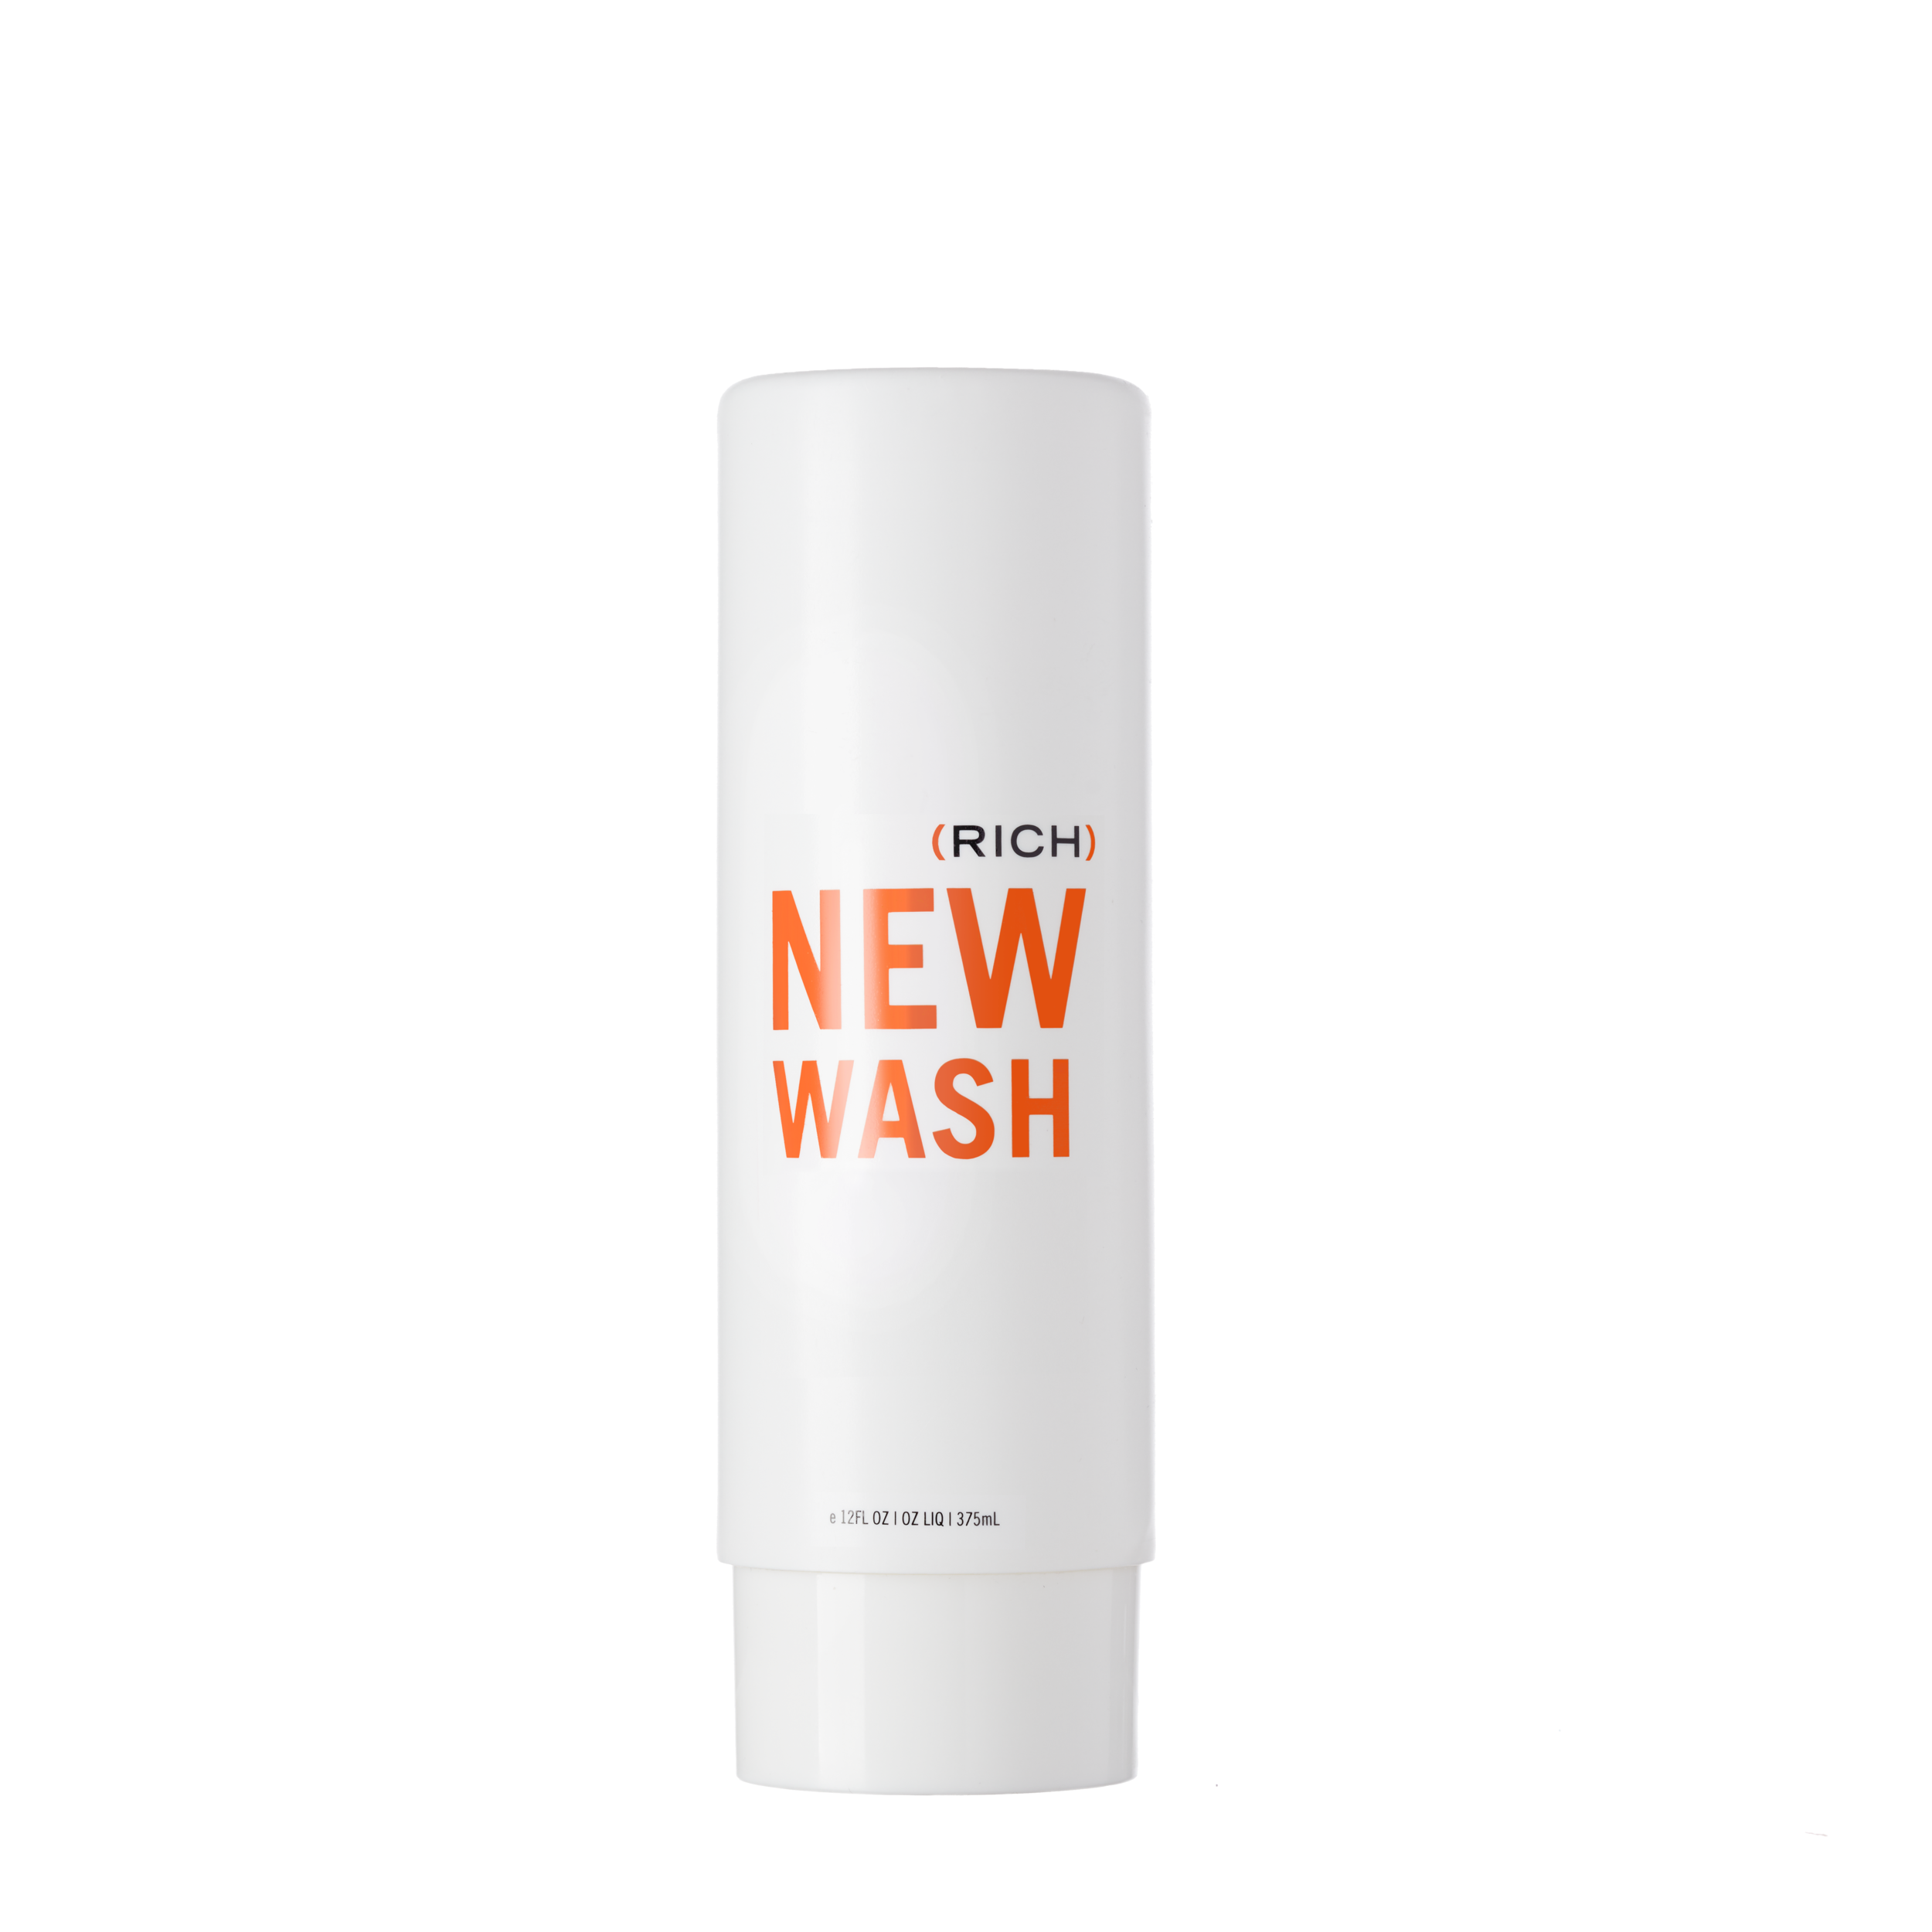 Hairstory - New Wash